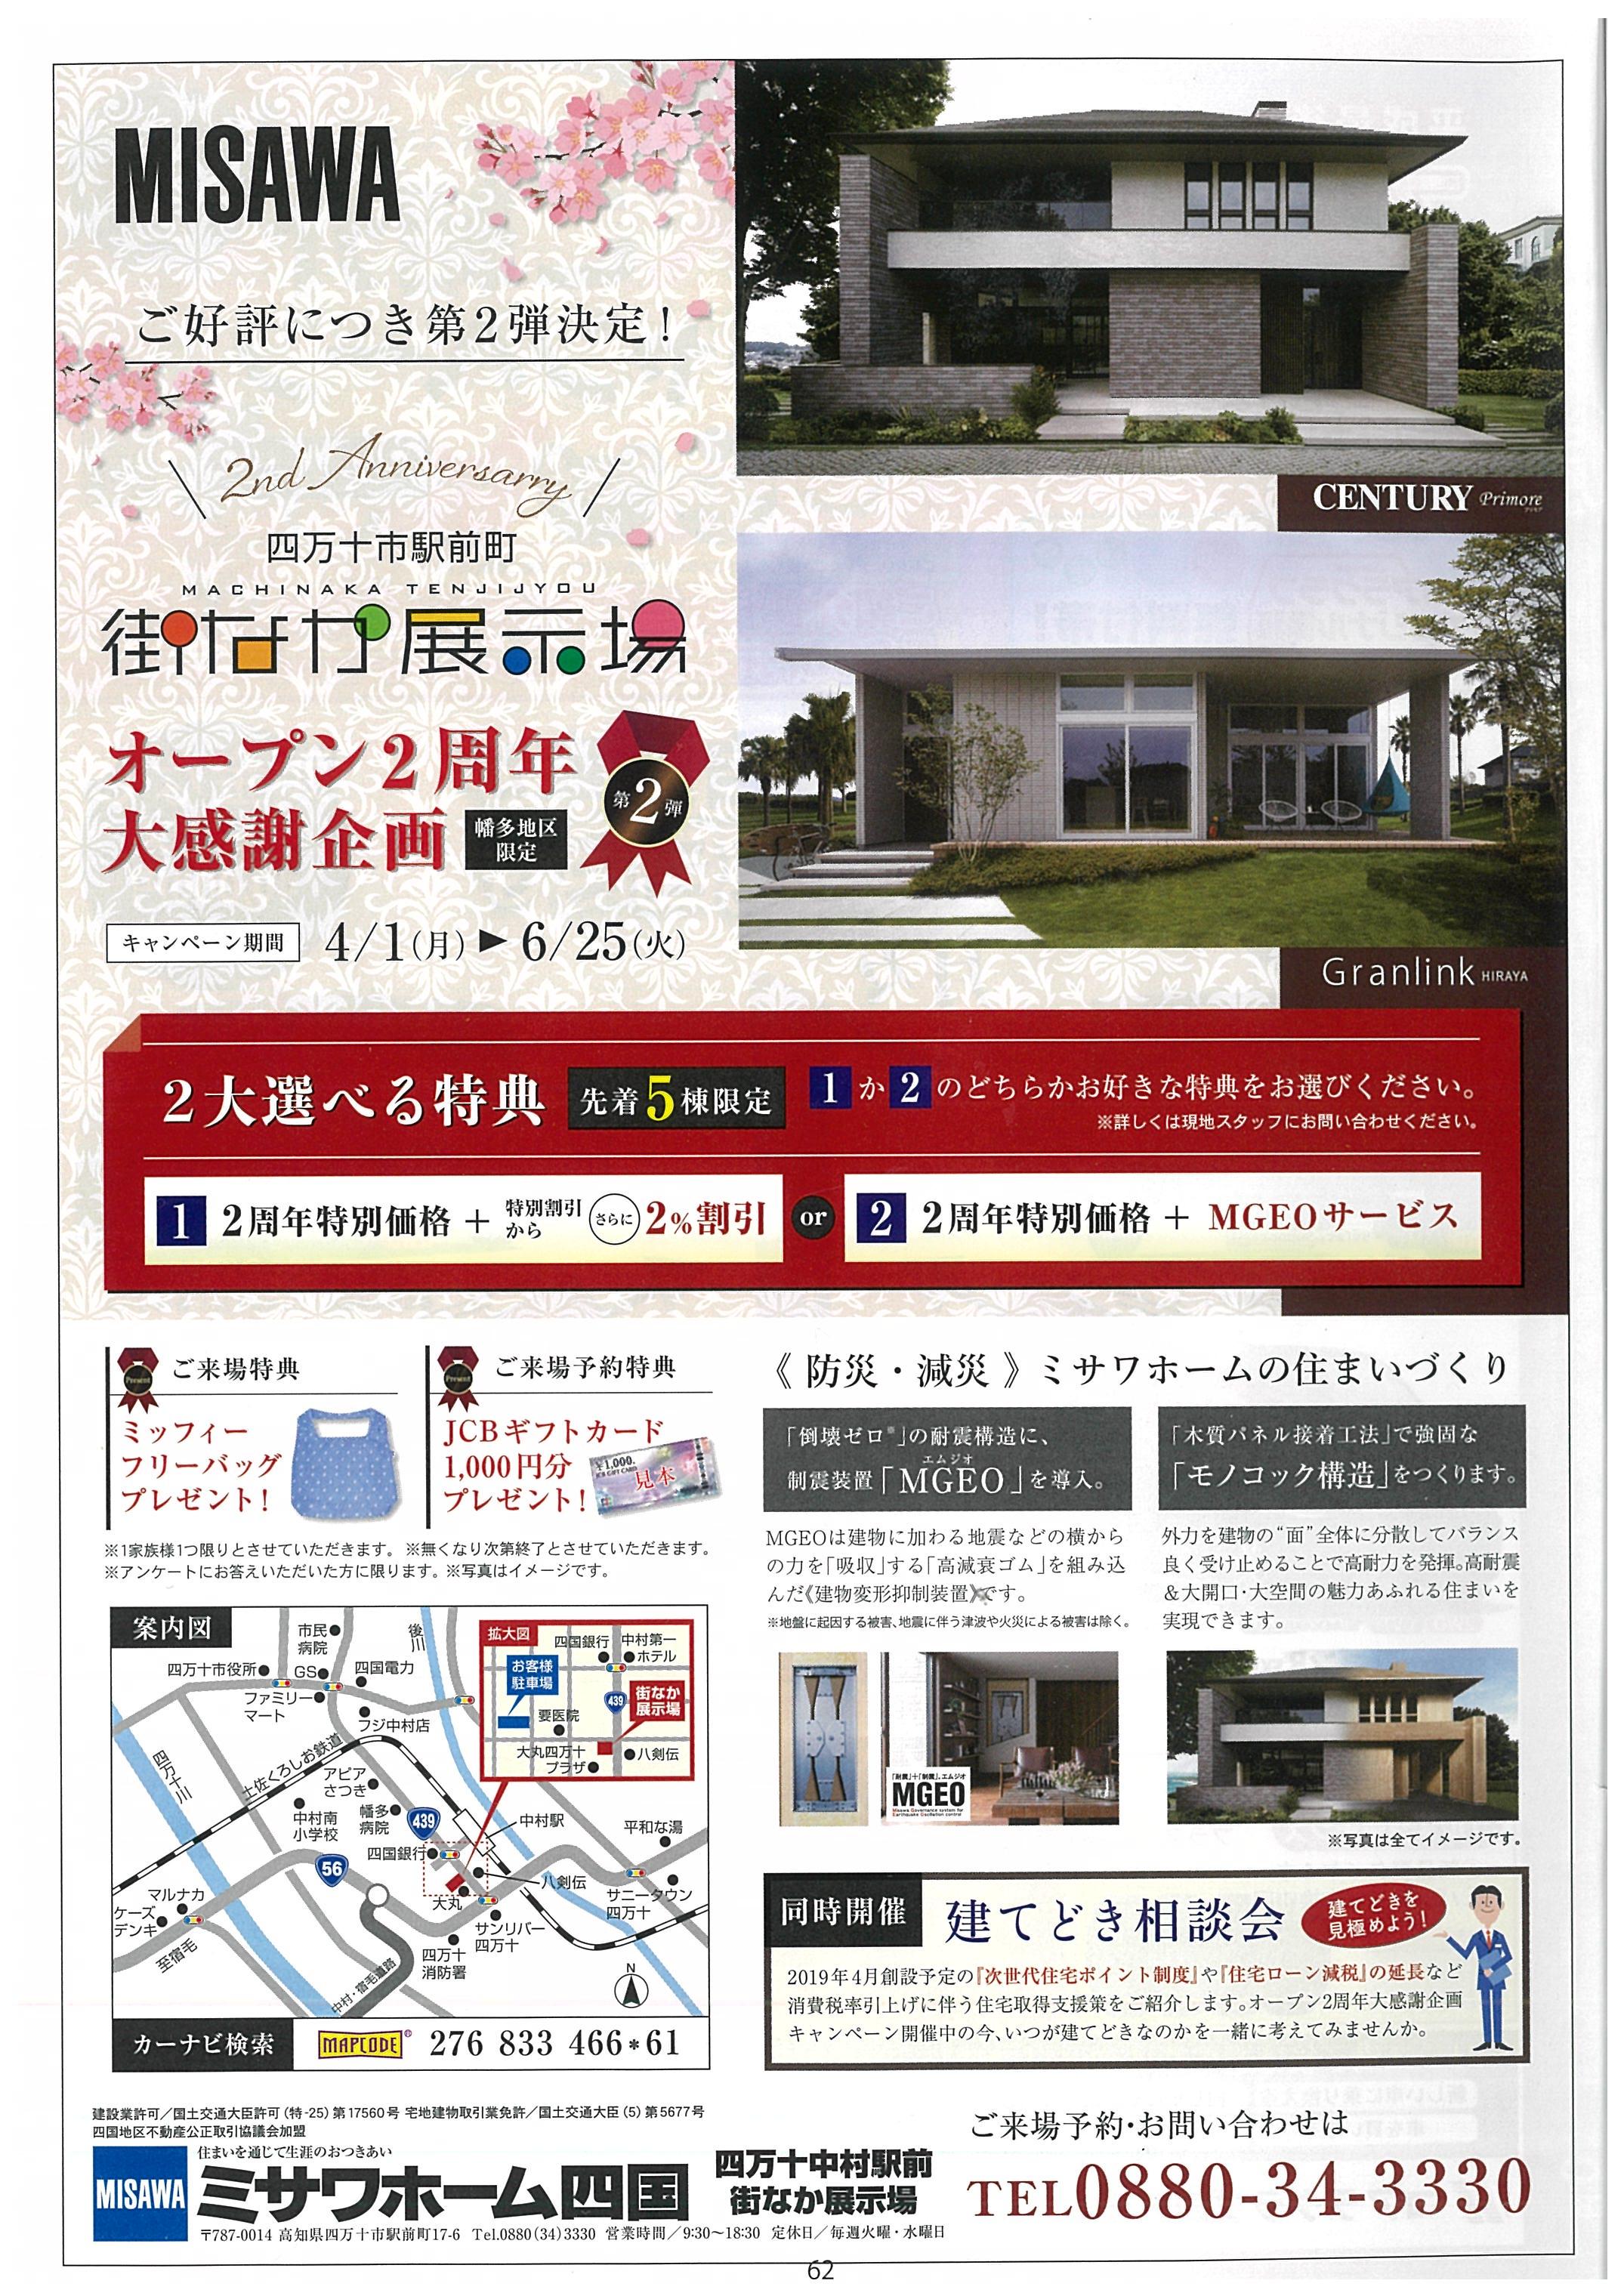 http://shikoku.misawa.co.jp/area_kouchi/20190406160435.jpg